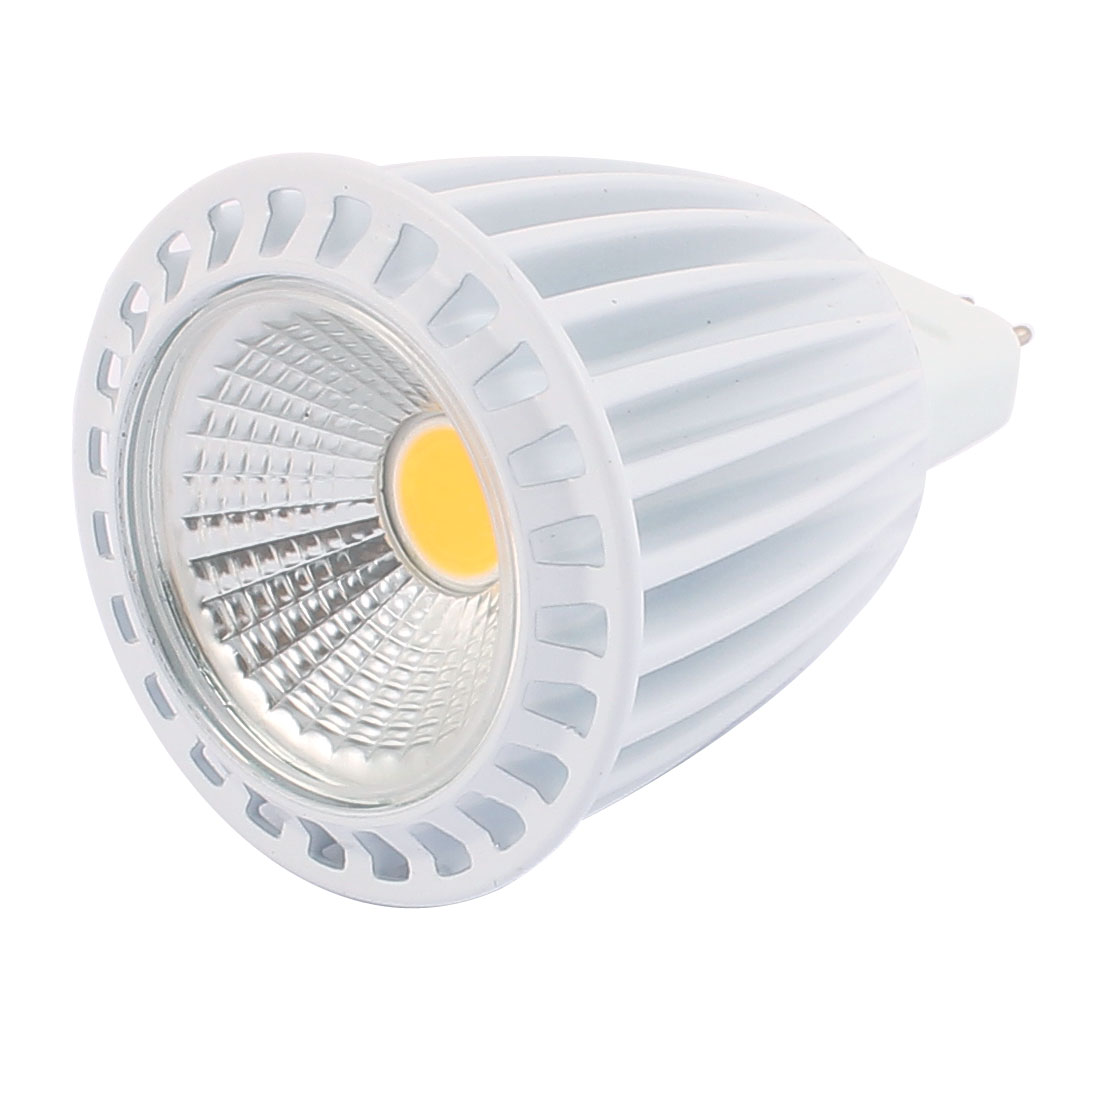 DC12V 7W MR16 COB Integrated Chip LED Spotlight Lamp Bulb Downlight Pure White